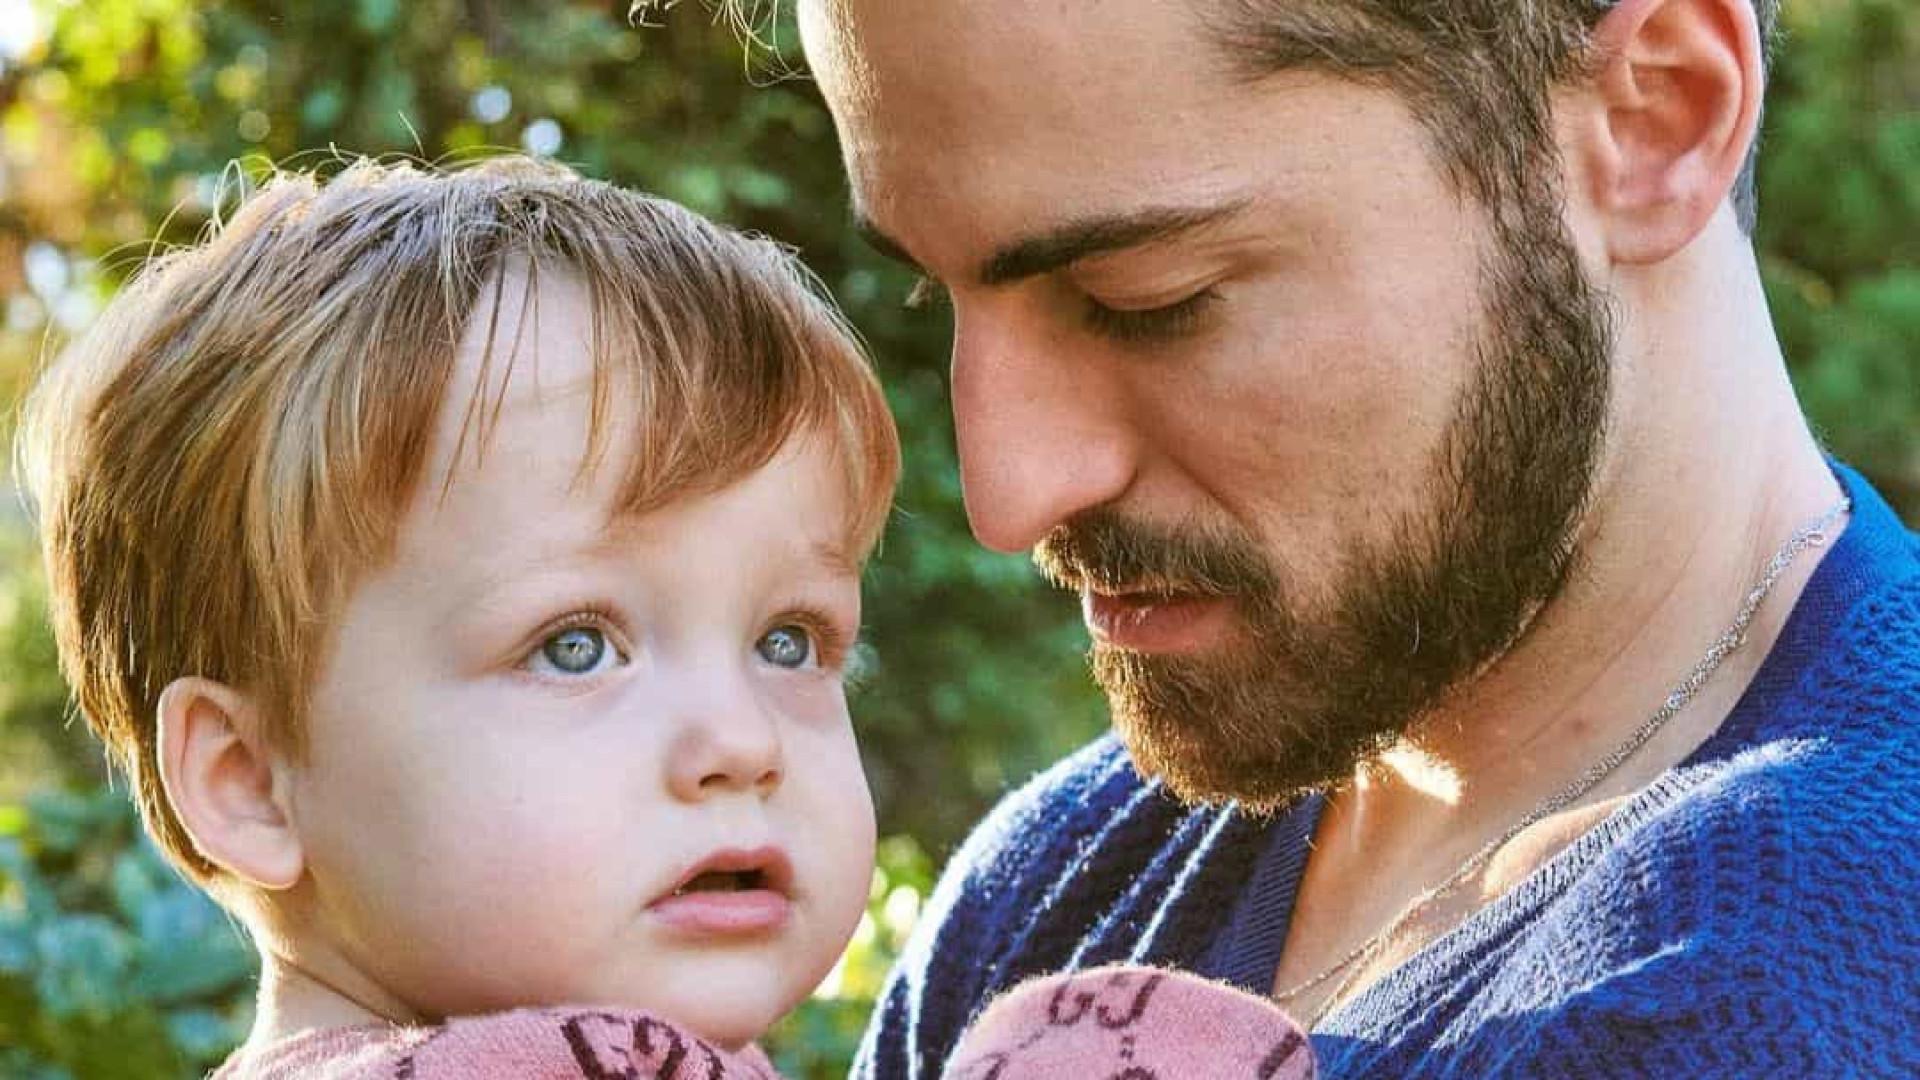 'Amor da minha vida', Thales Bretas, viúvo de Paulo Gustavo, homenageia filho